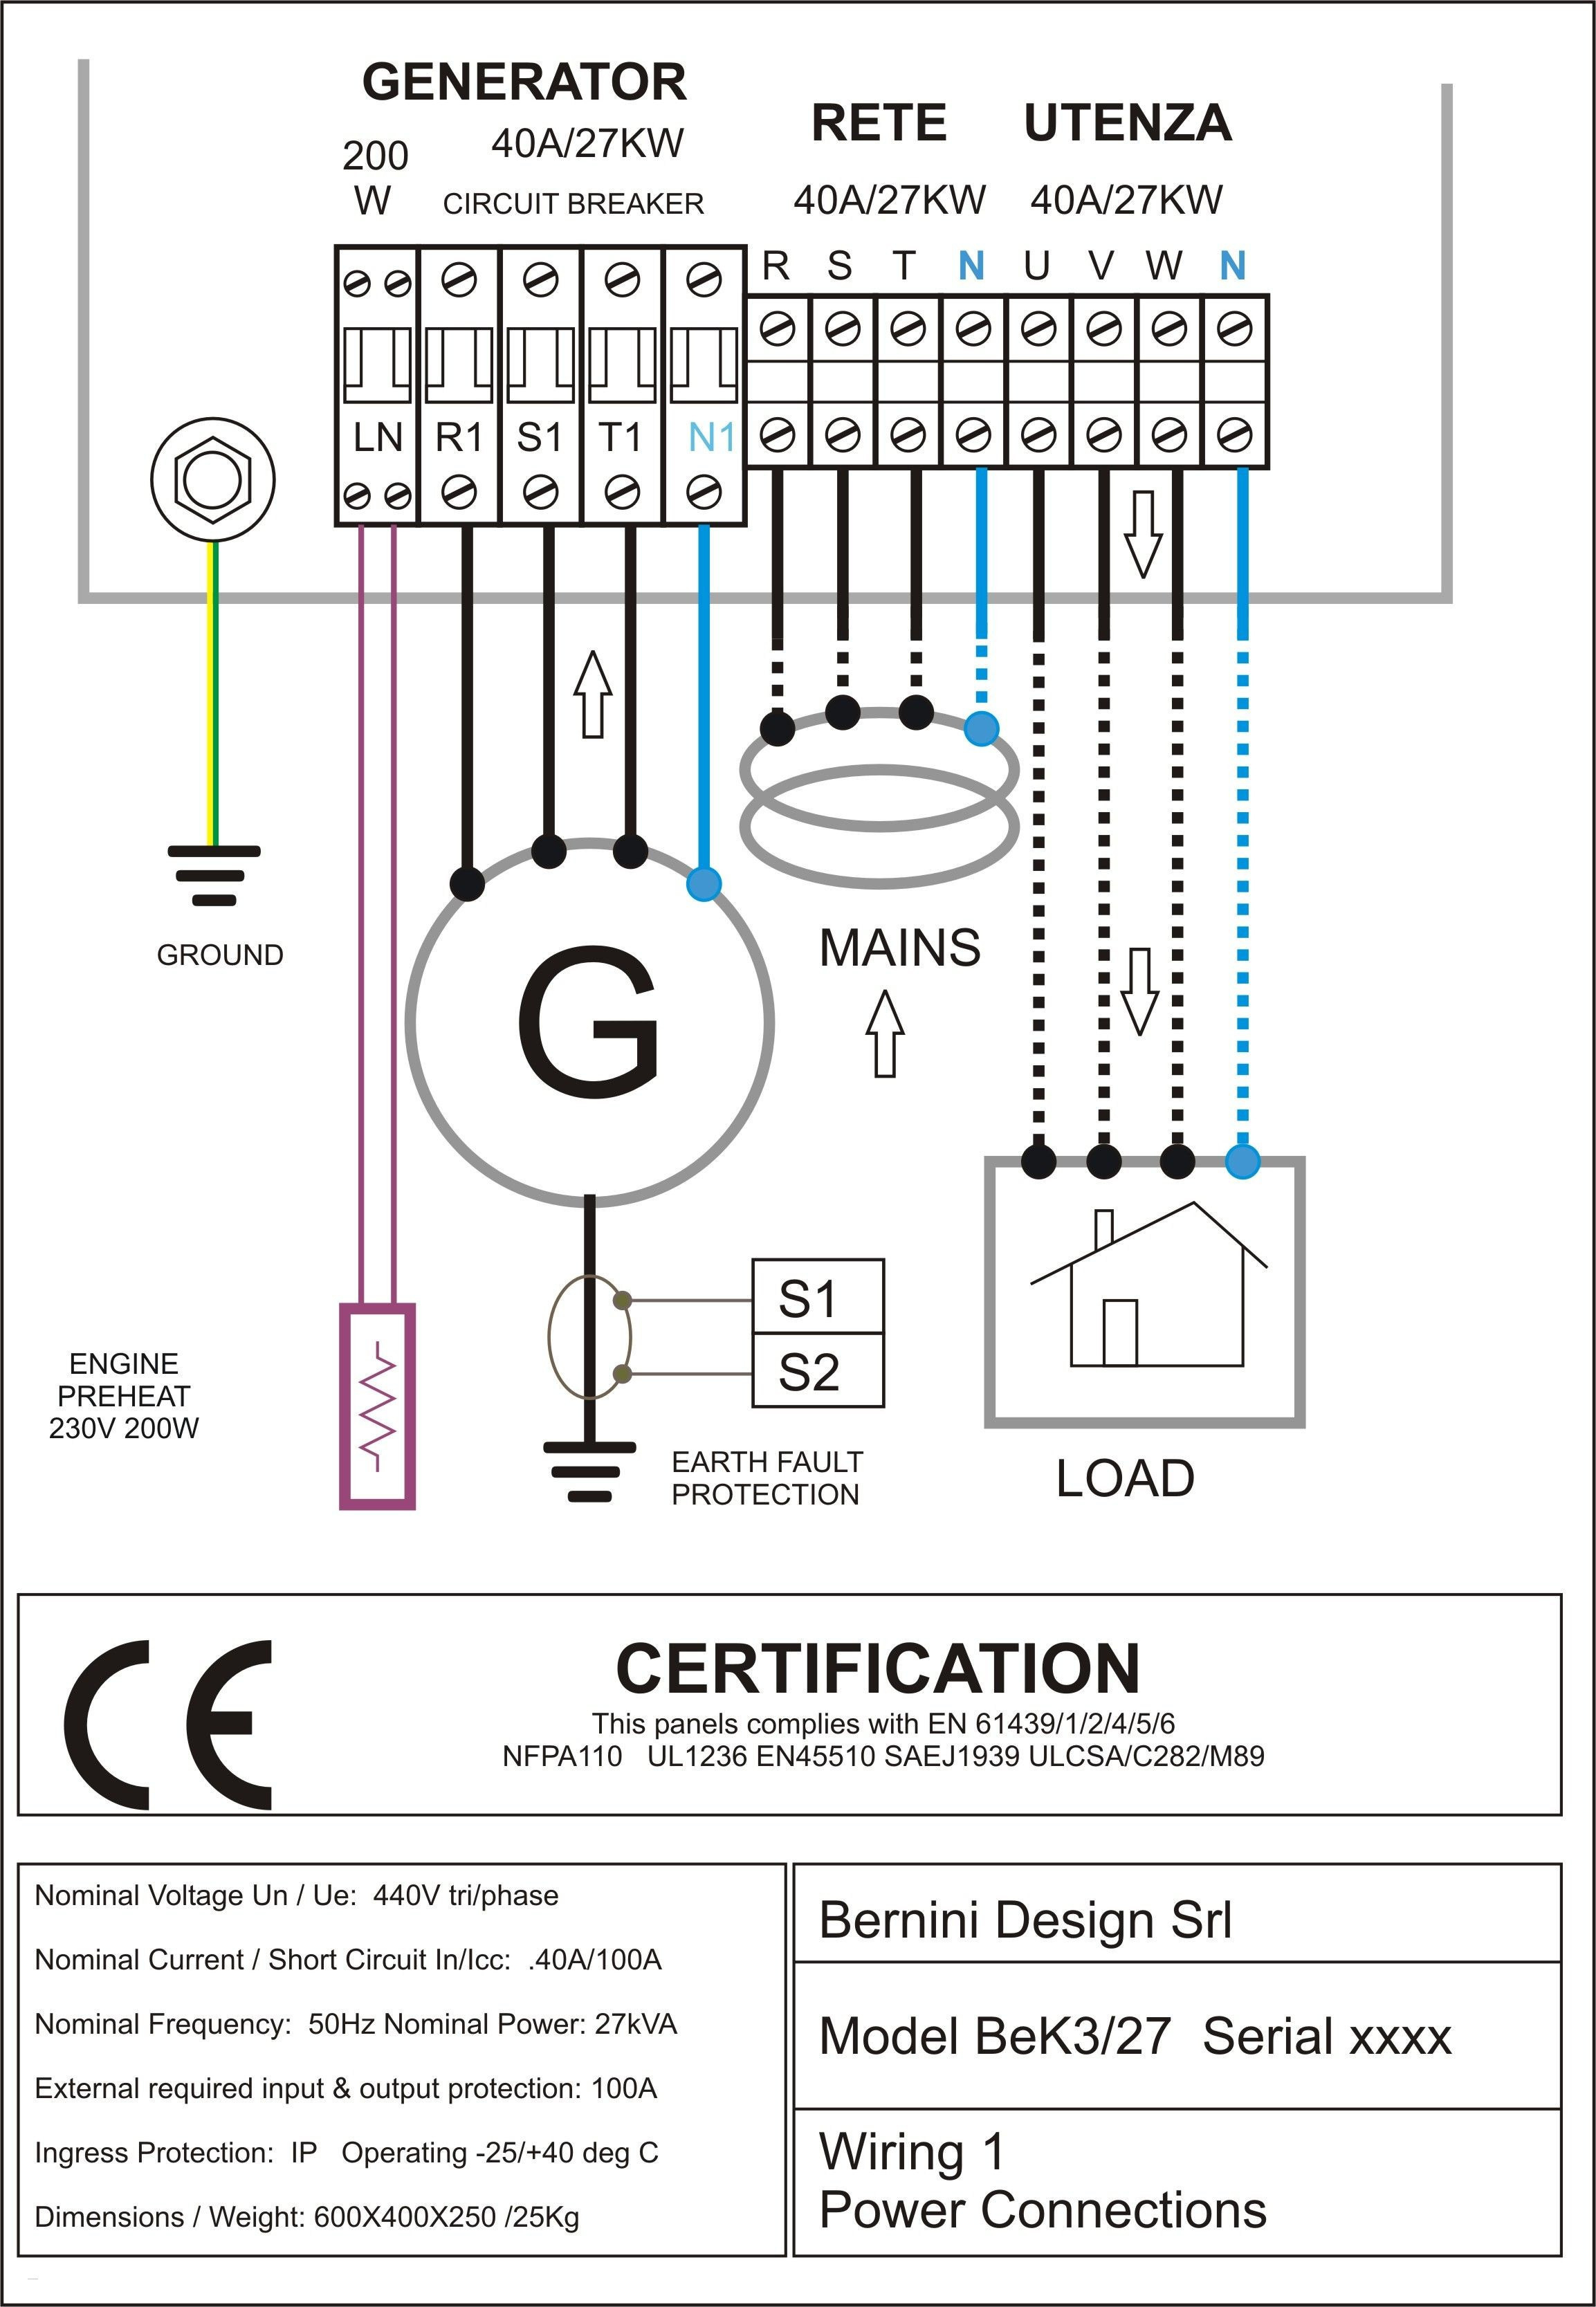 Generator Backfeed Wiring Diagram Fresh Nice 87 Generator Diagram - Generator Backfeed Wiring Diagram